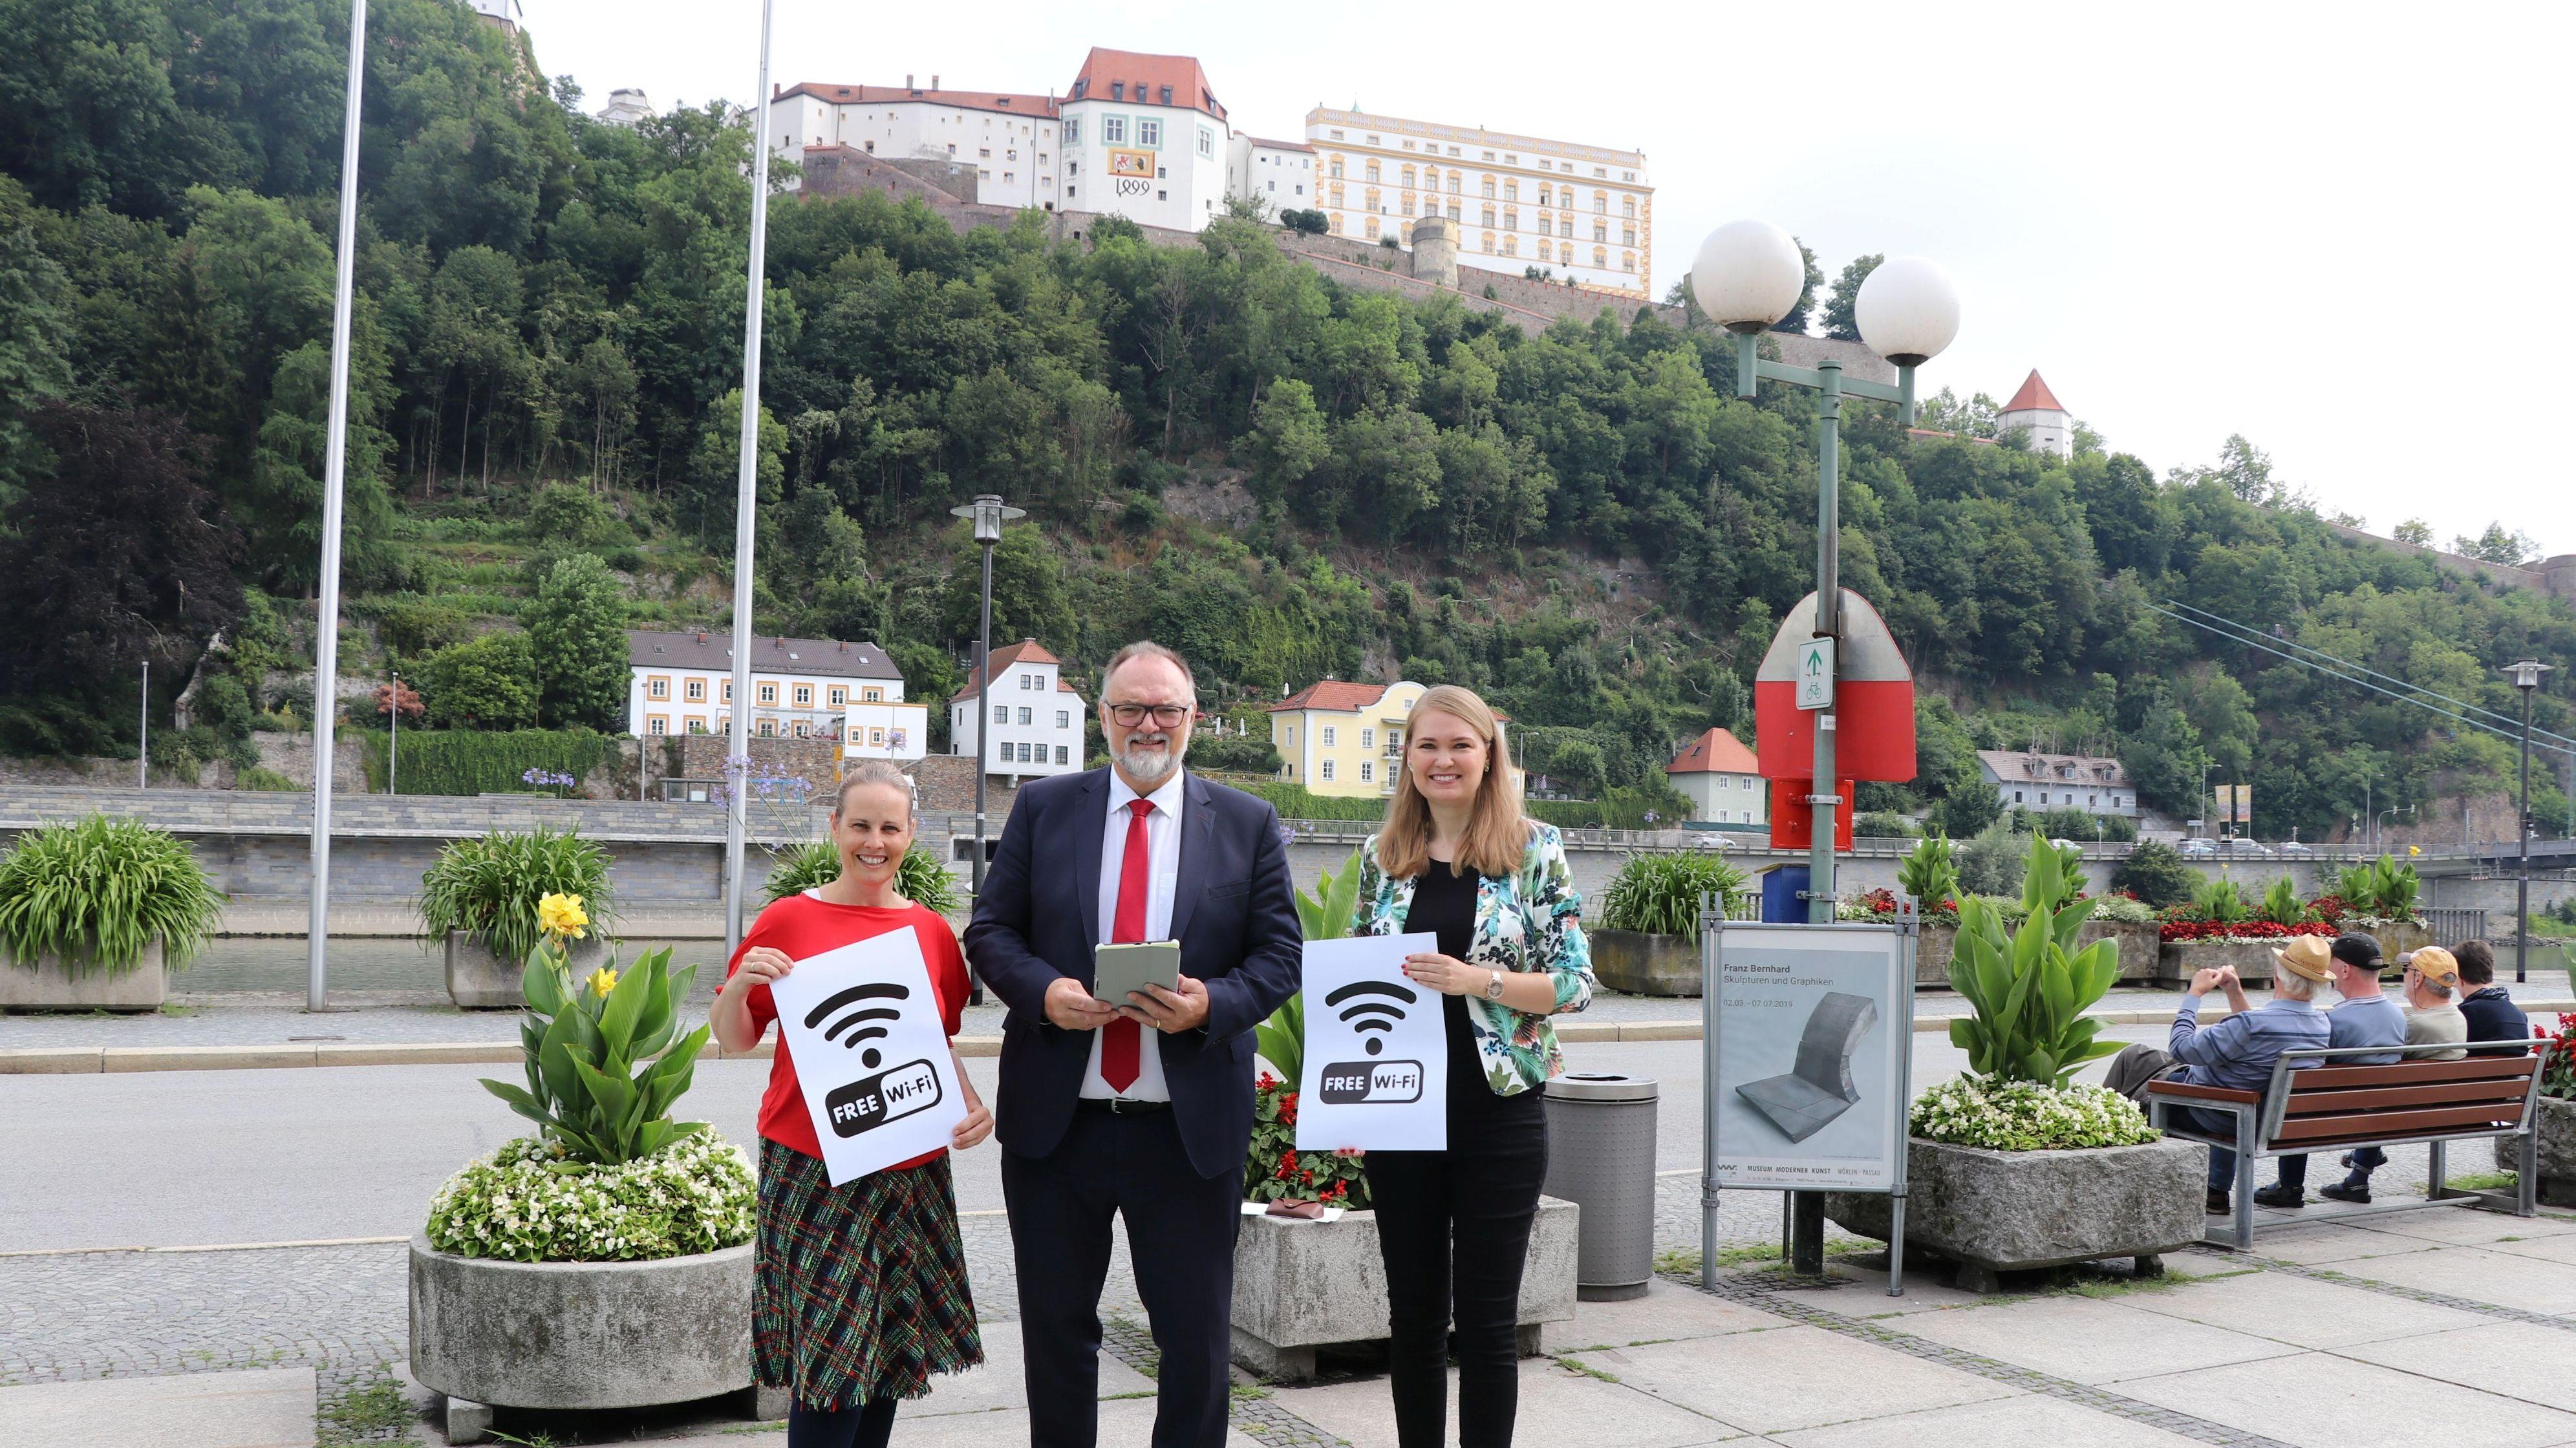 Passaus OB Jürgen Dupper vor der Veste Oberhaus